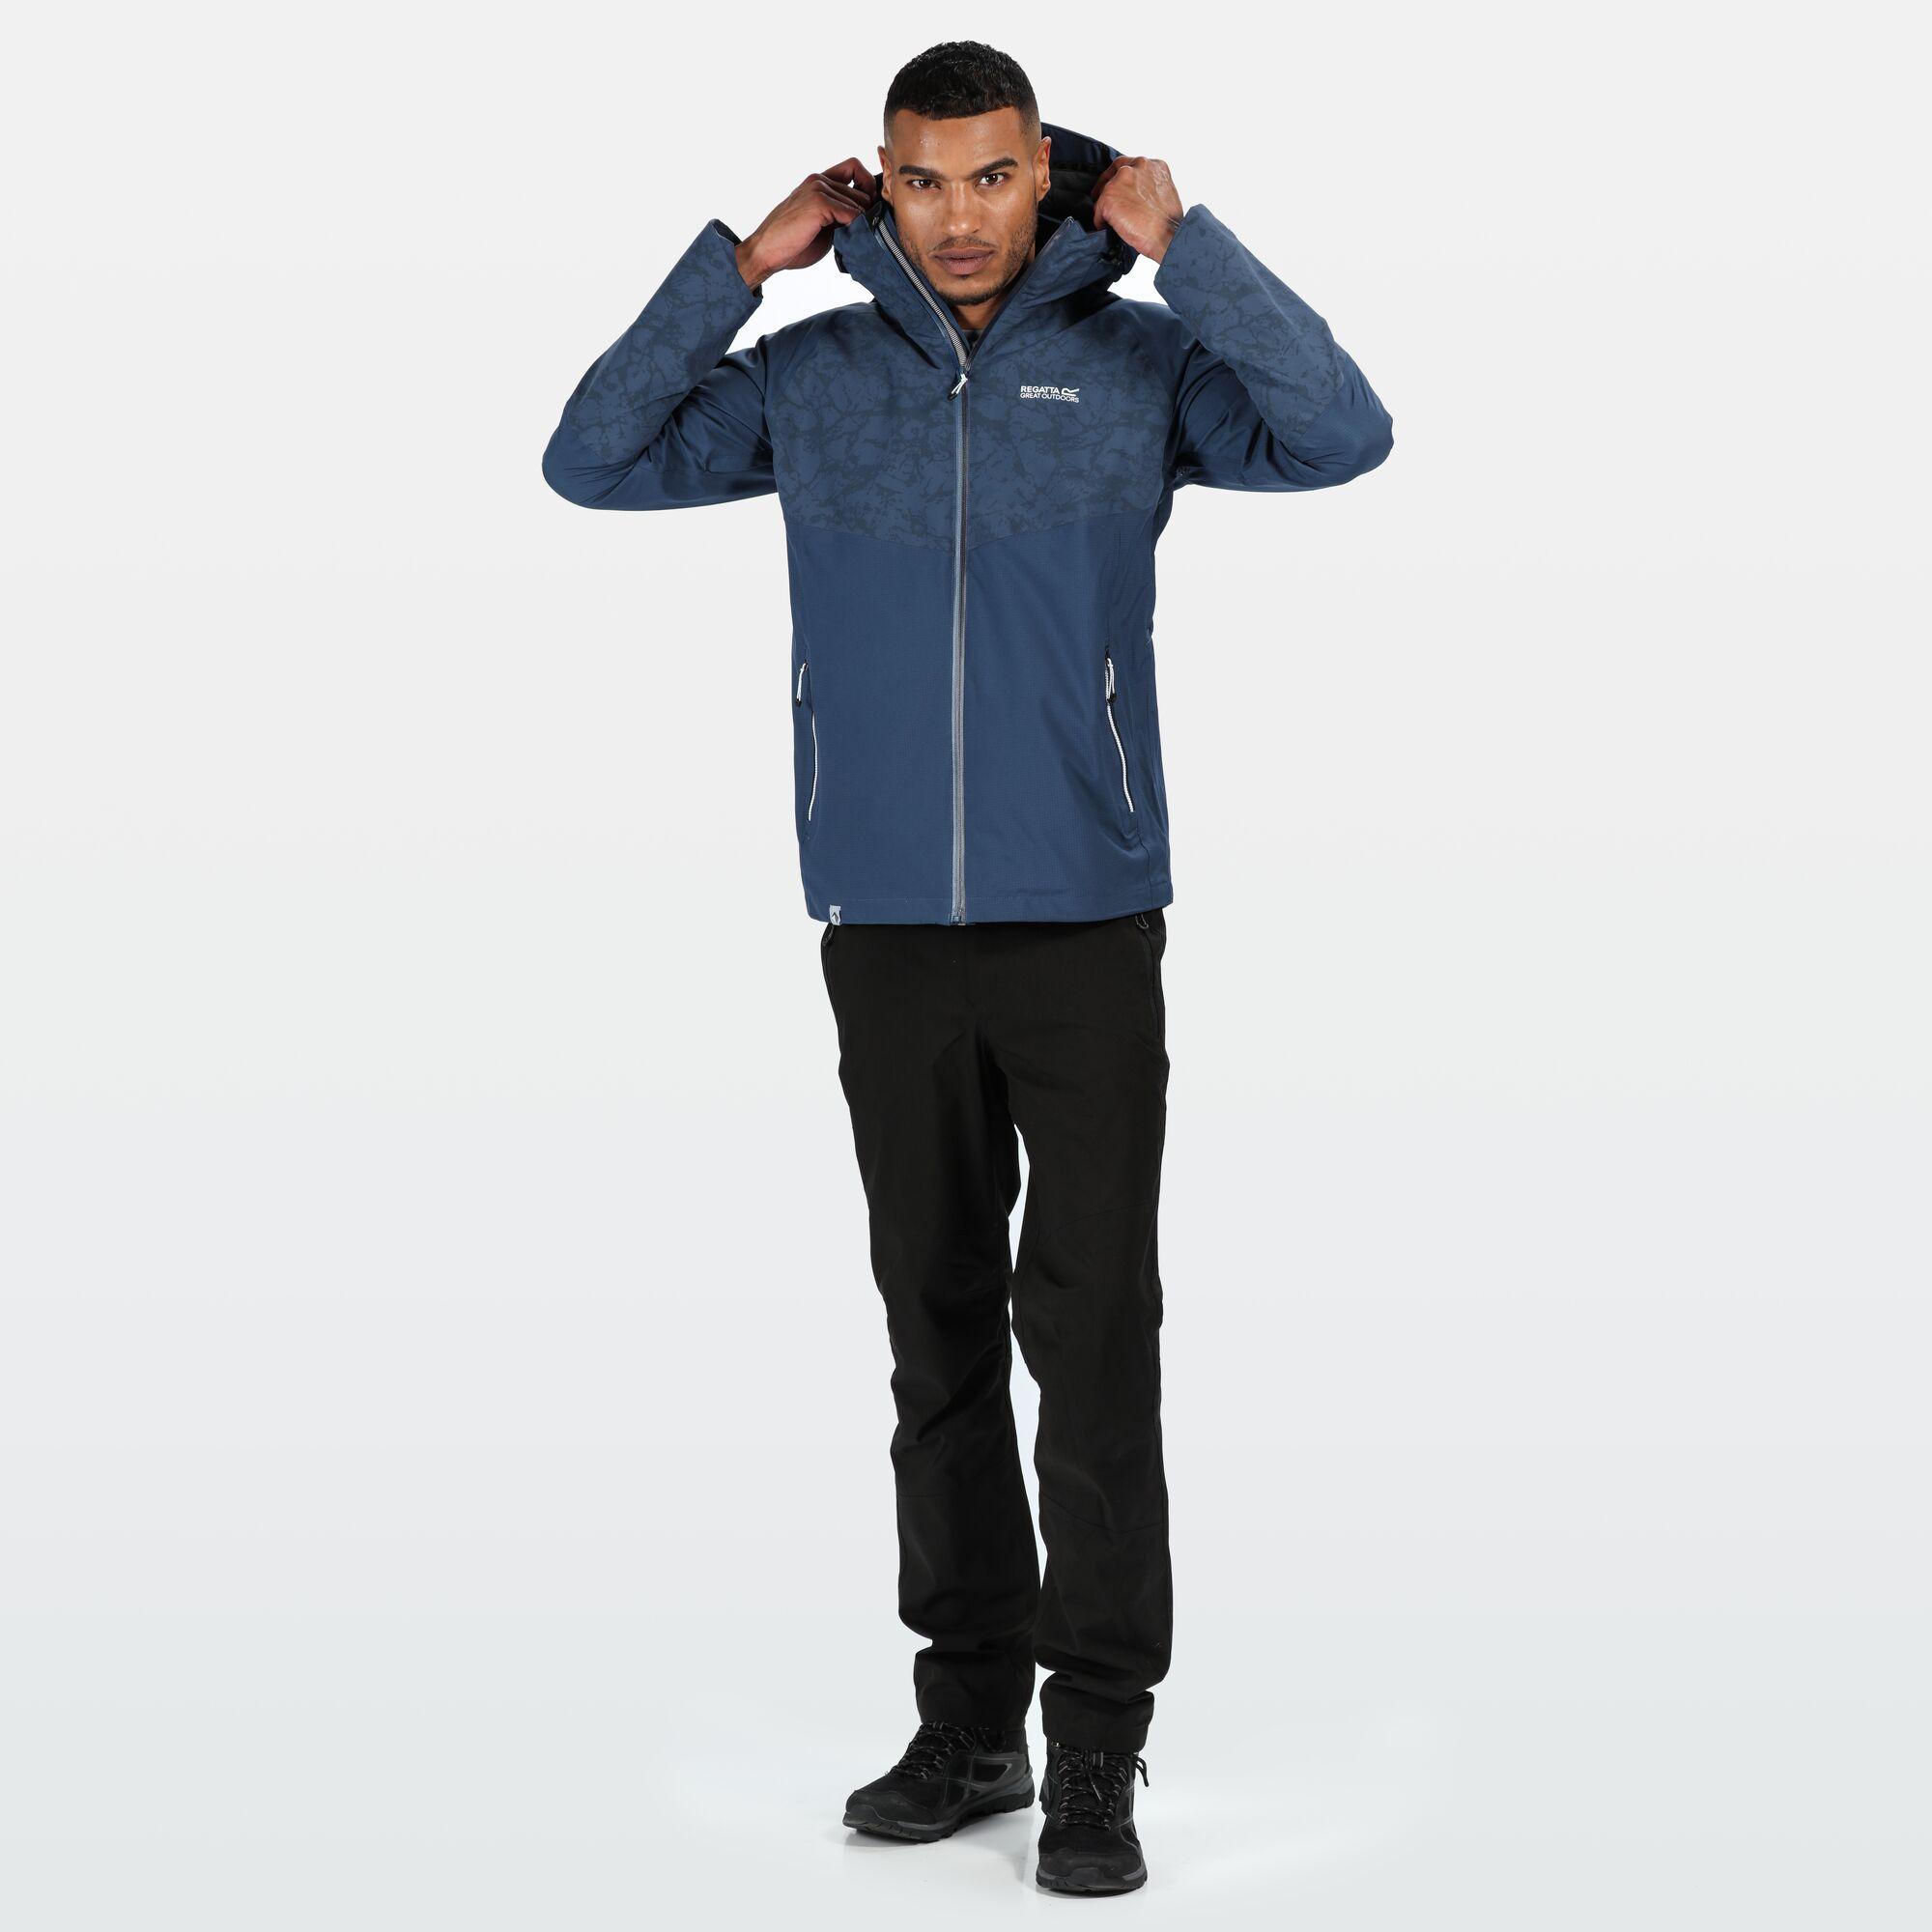 Regatta-Men-039-s-Oklahoma-V-Reflective-Waterproof-Hooded-Walking-Jacket-Blue thumbnail 8